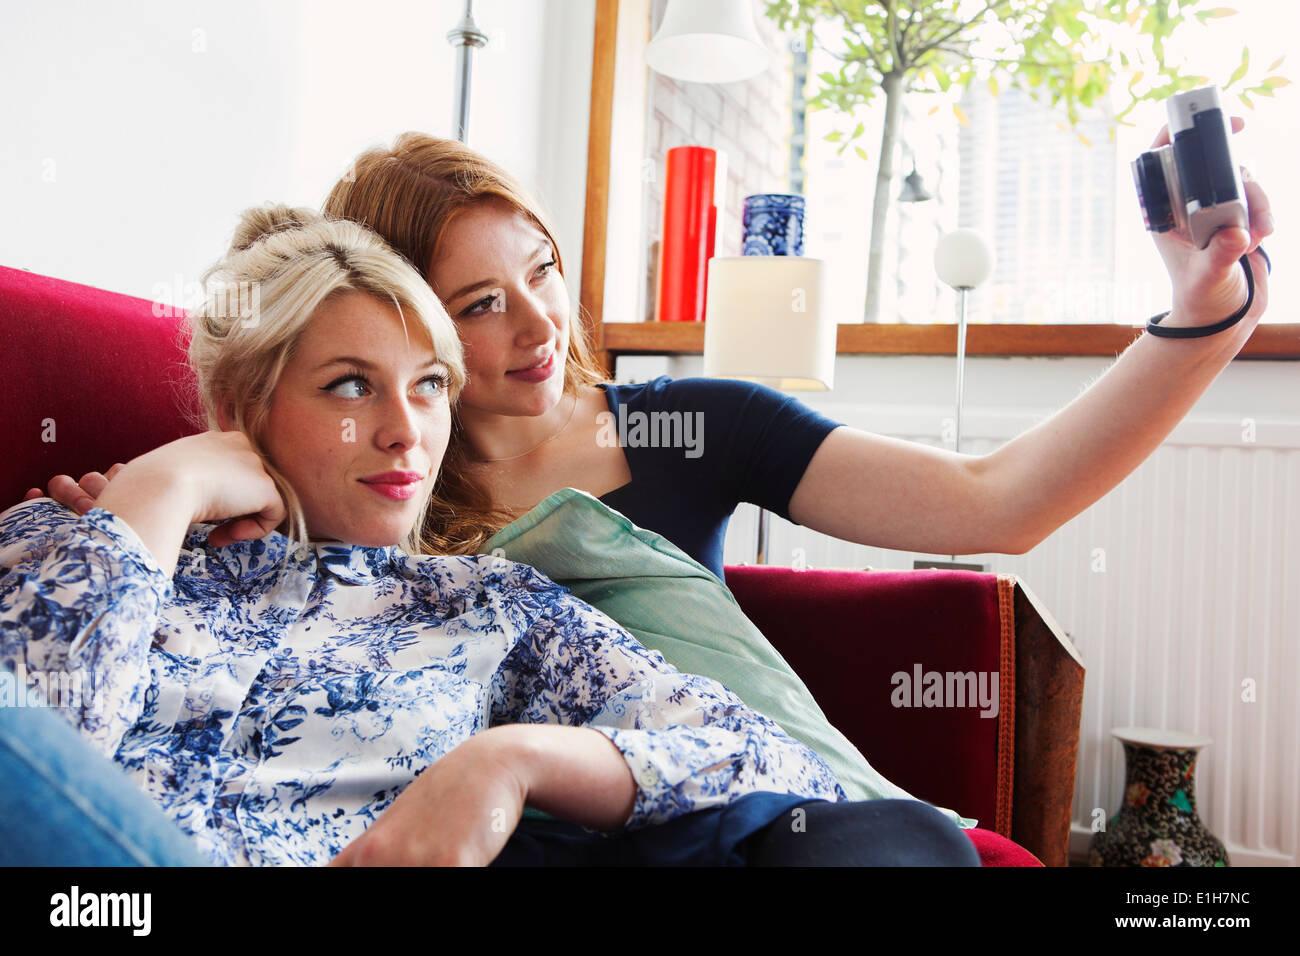 Young women sitting on sofa, taking self portrait photograph Stock Photo